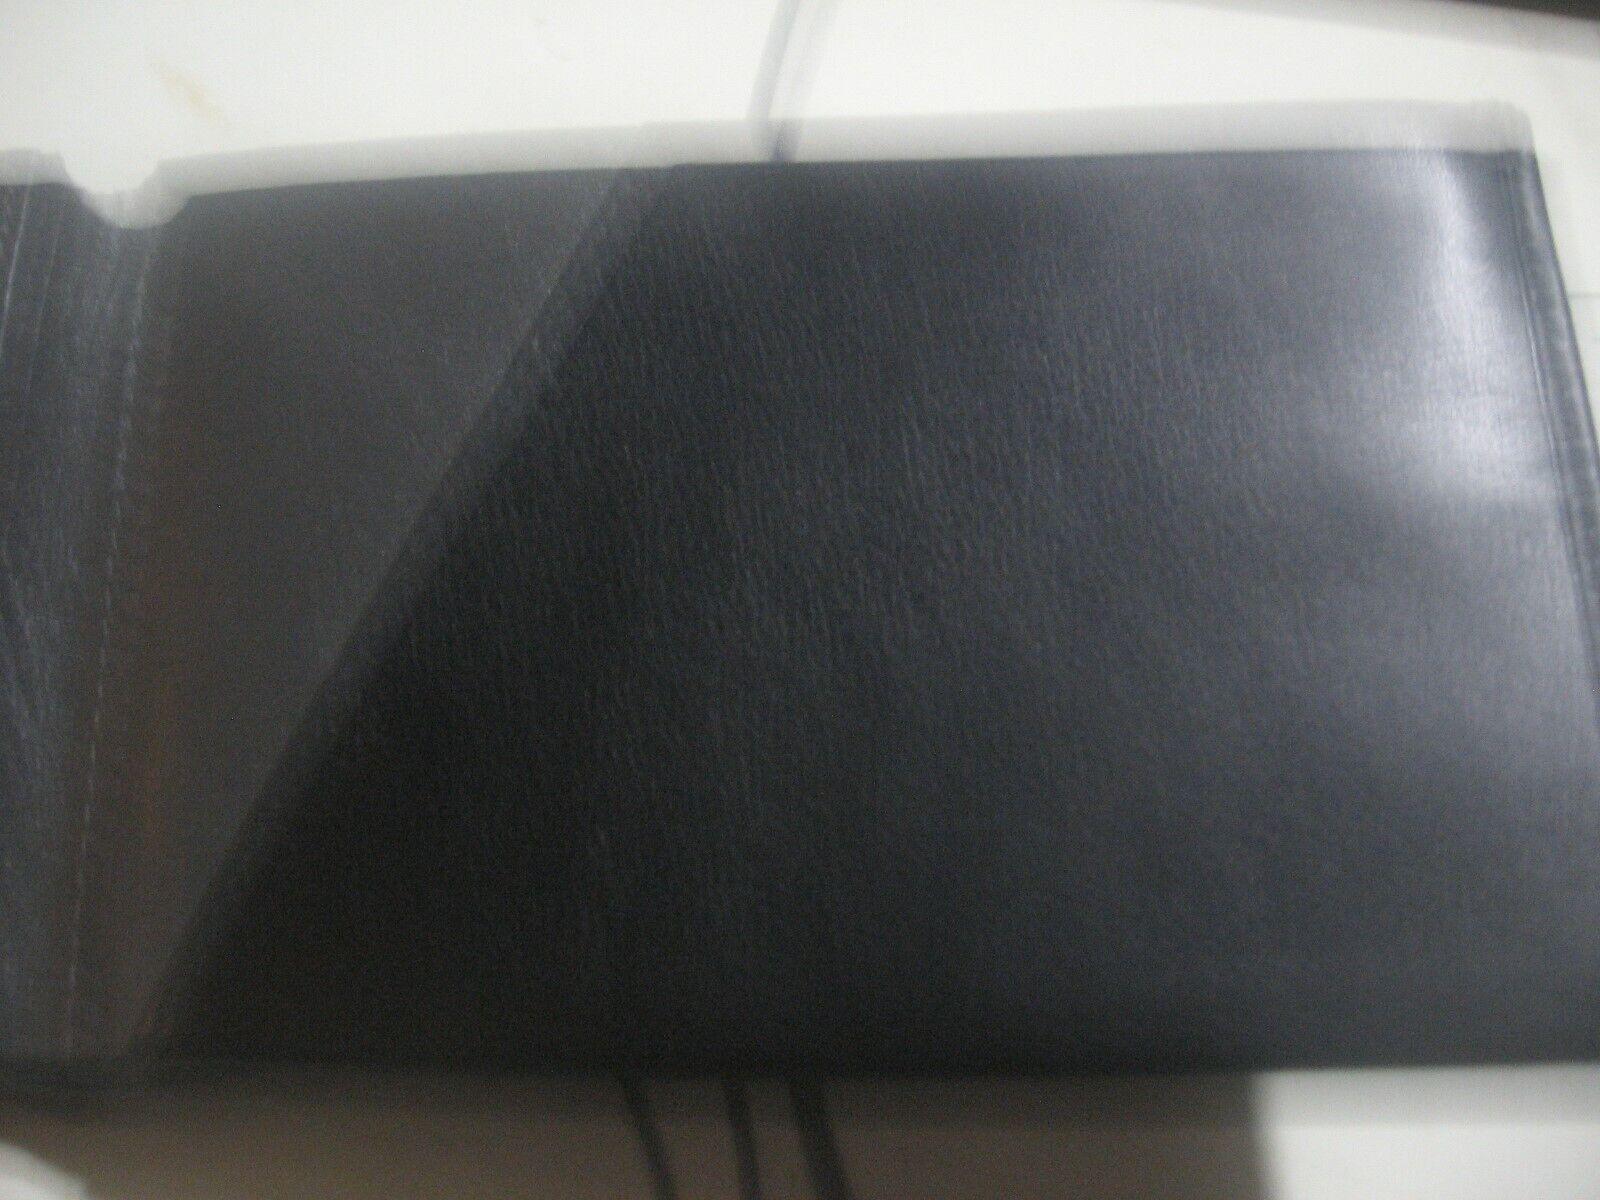 New Ernest Millar Black Leather Travel Passport Wallet-Credit Card Slots-Money - $8.00